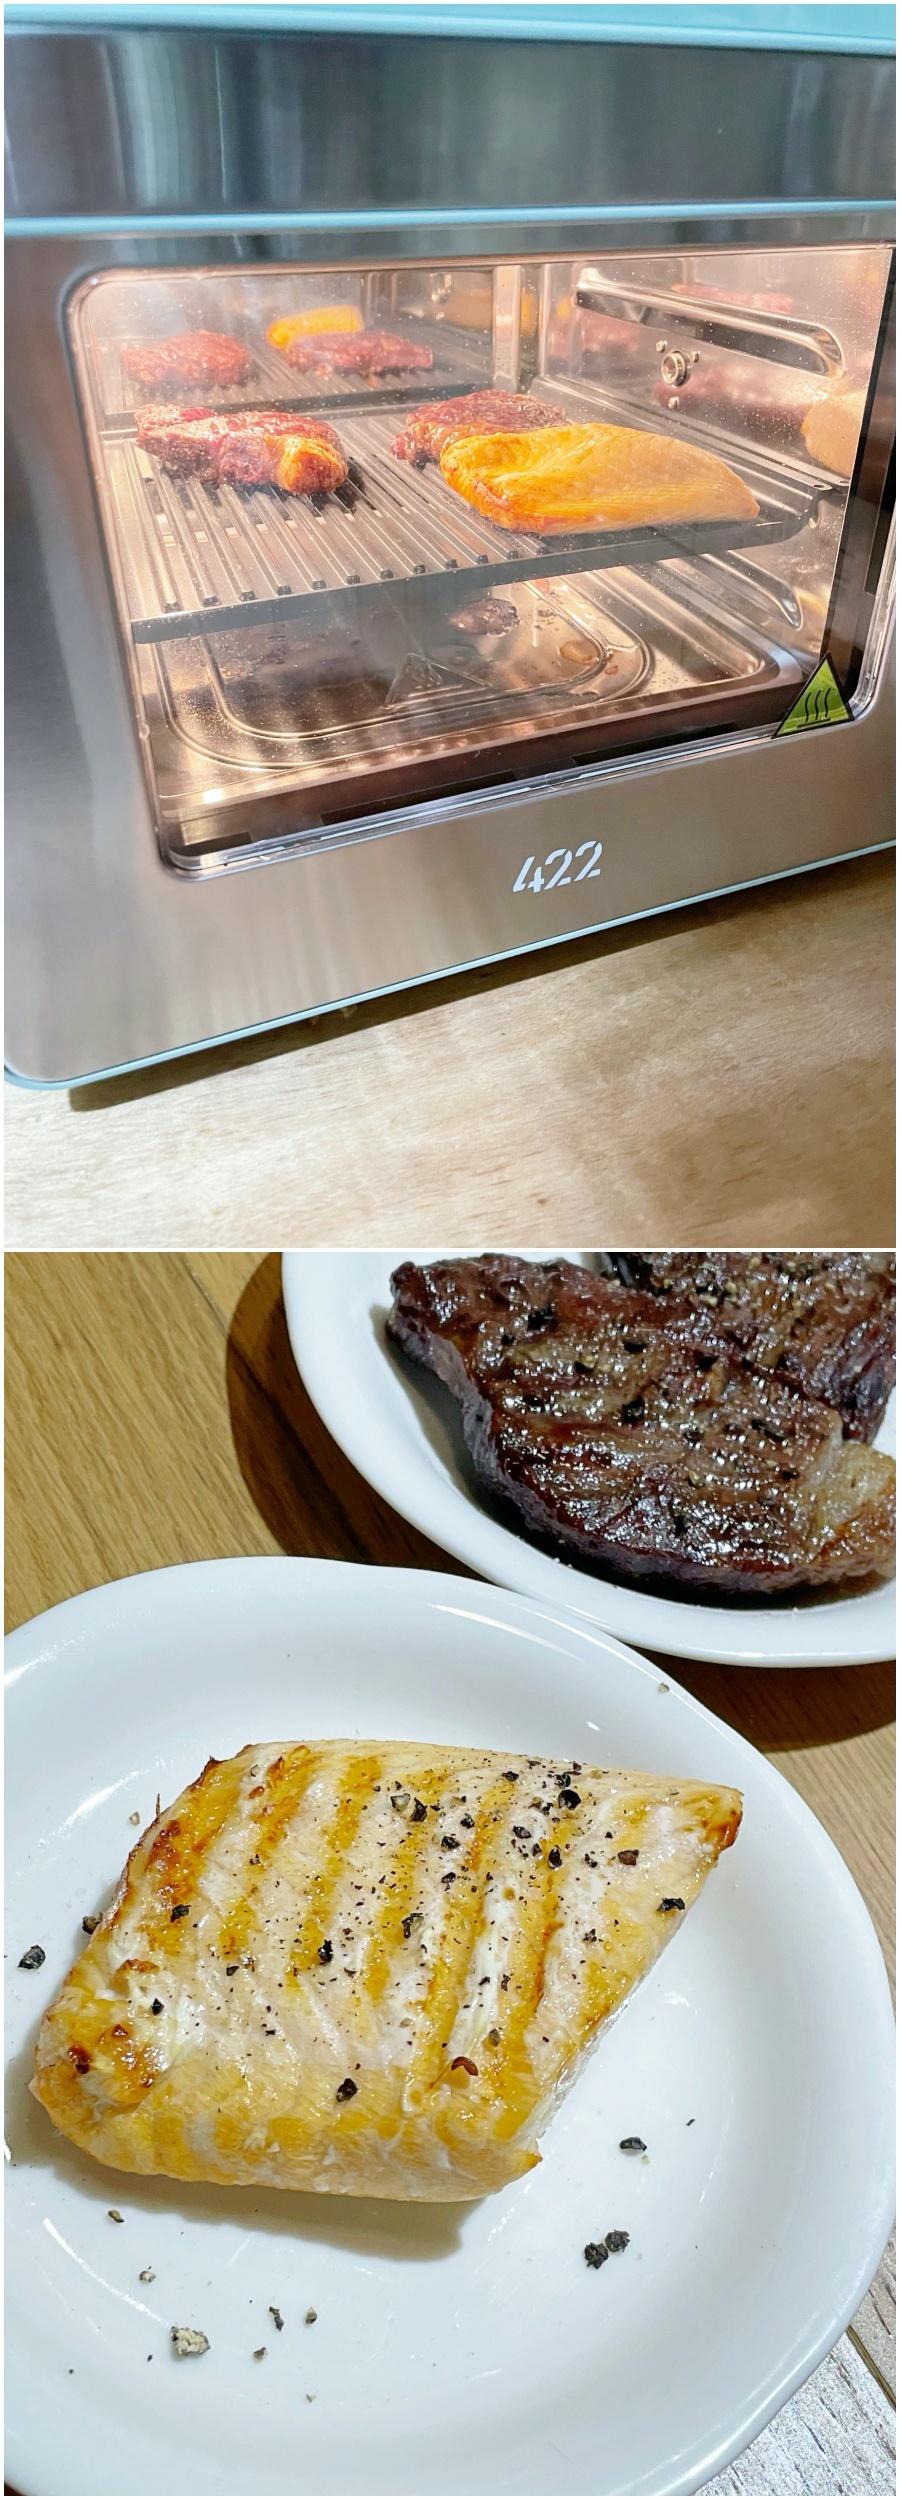 氣炸 牛排 冷凍